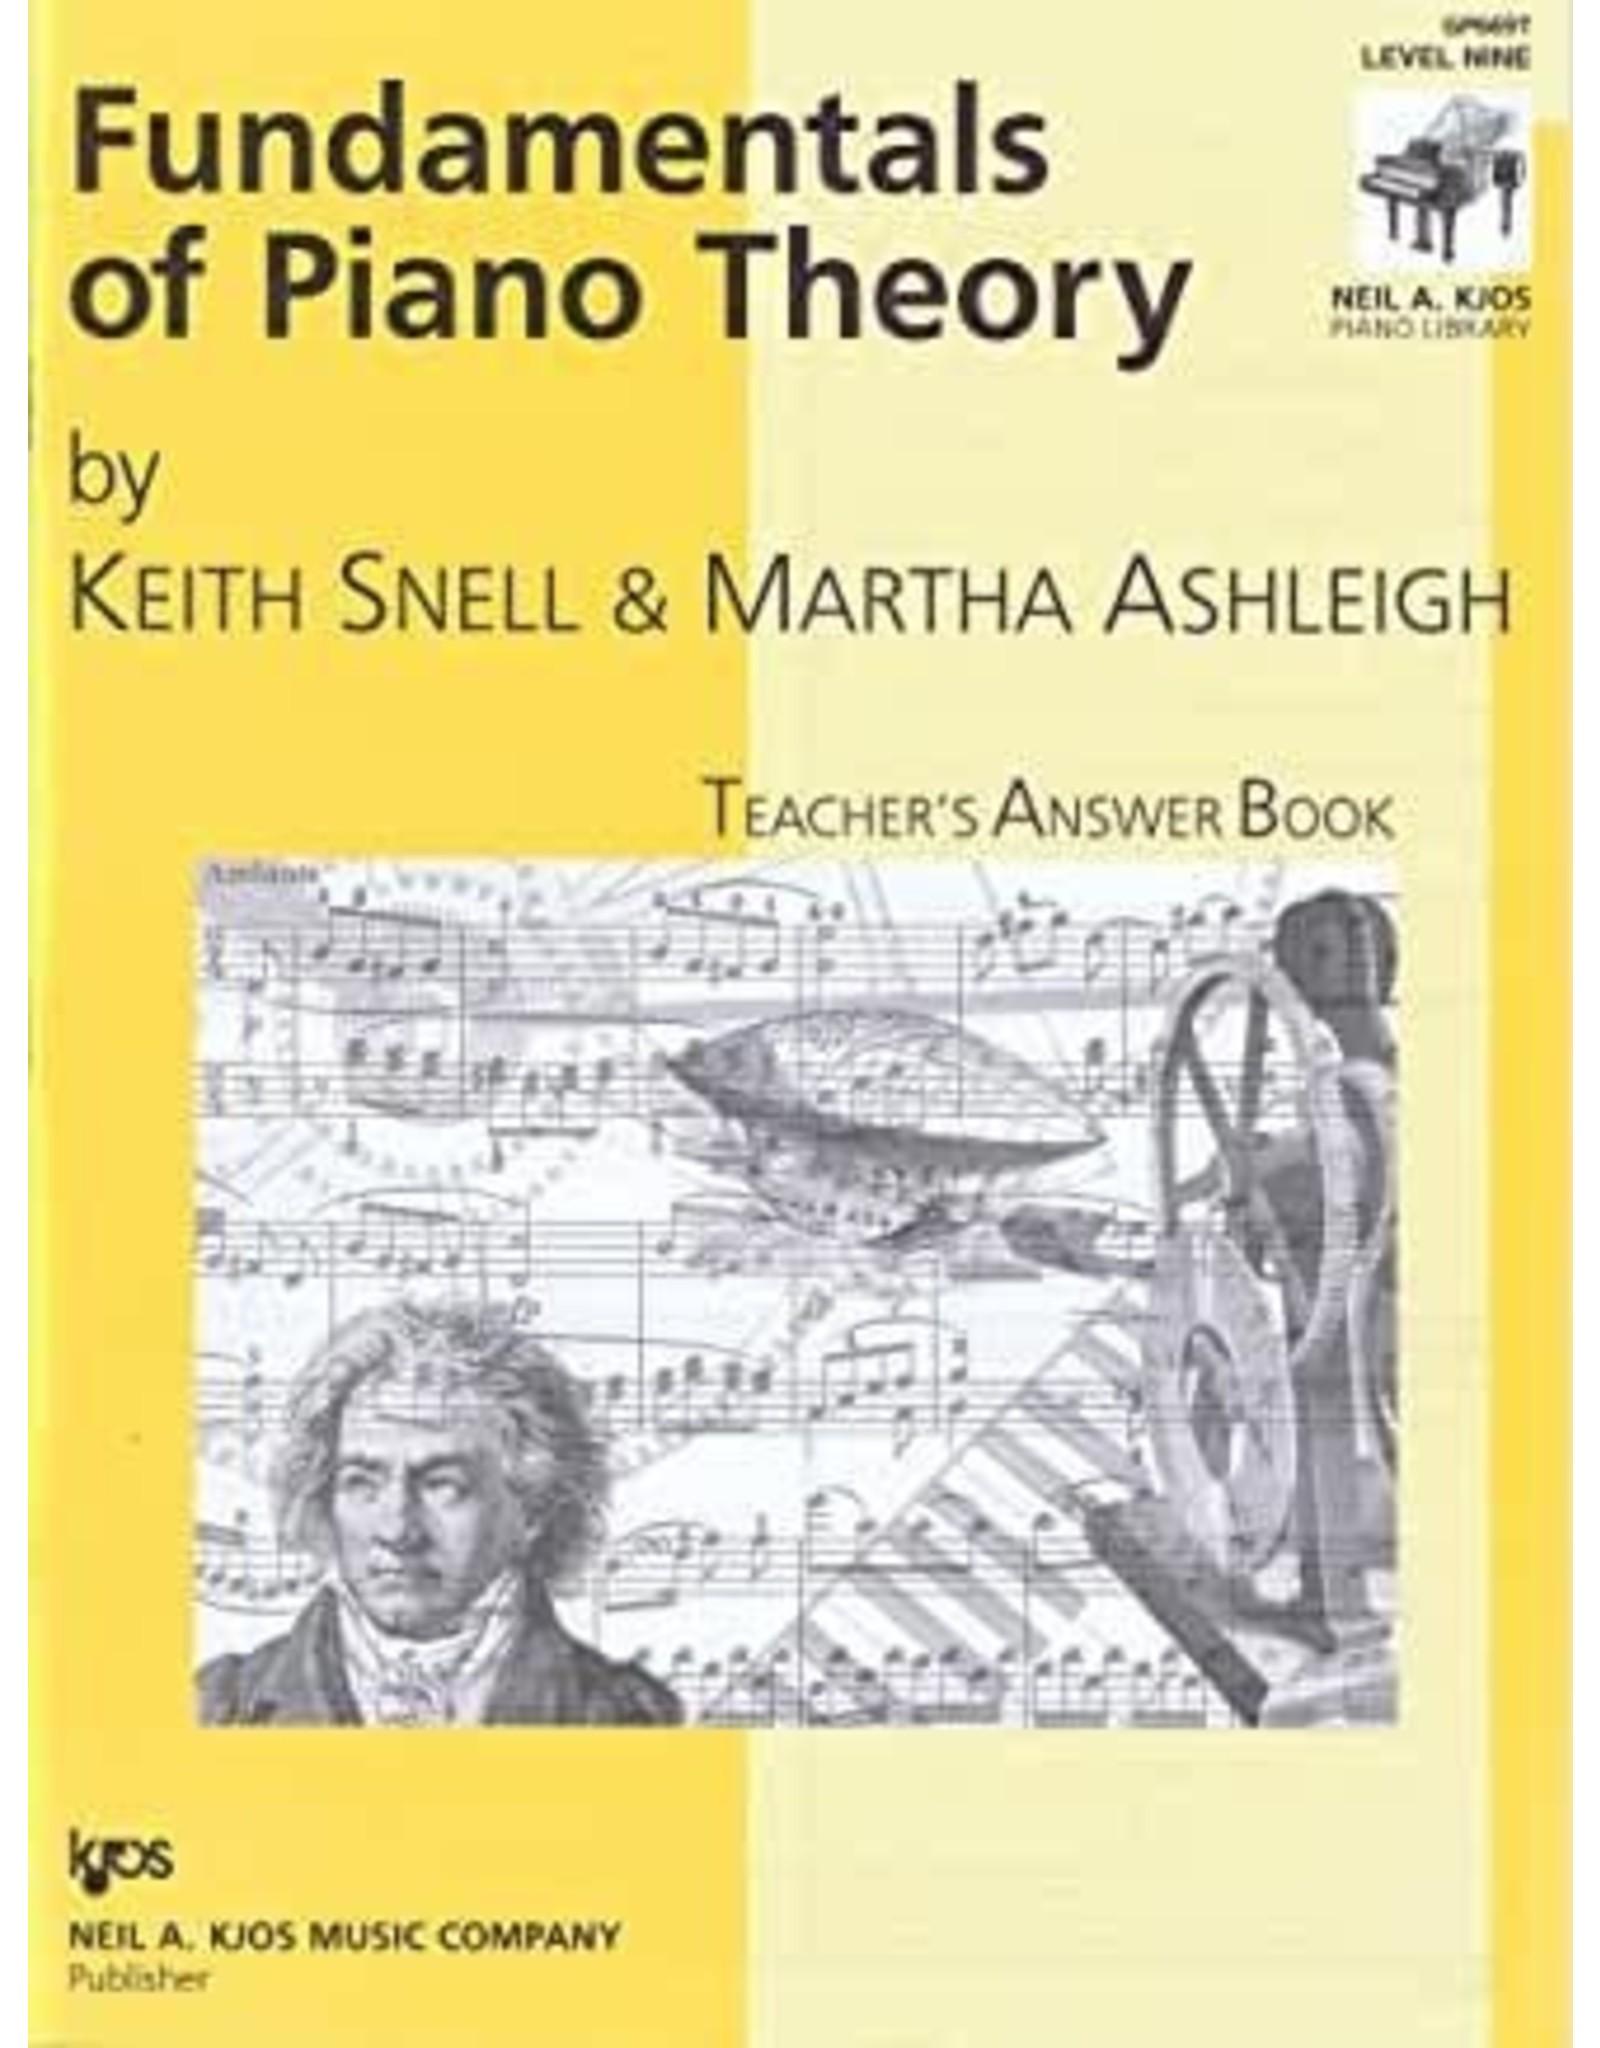 Kjos Fundamentals of Piano Theory, Level 9 Answer Book